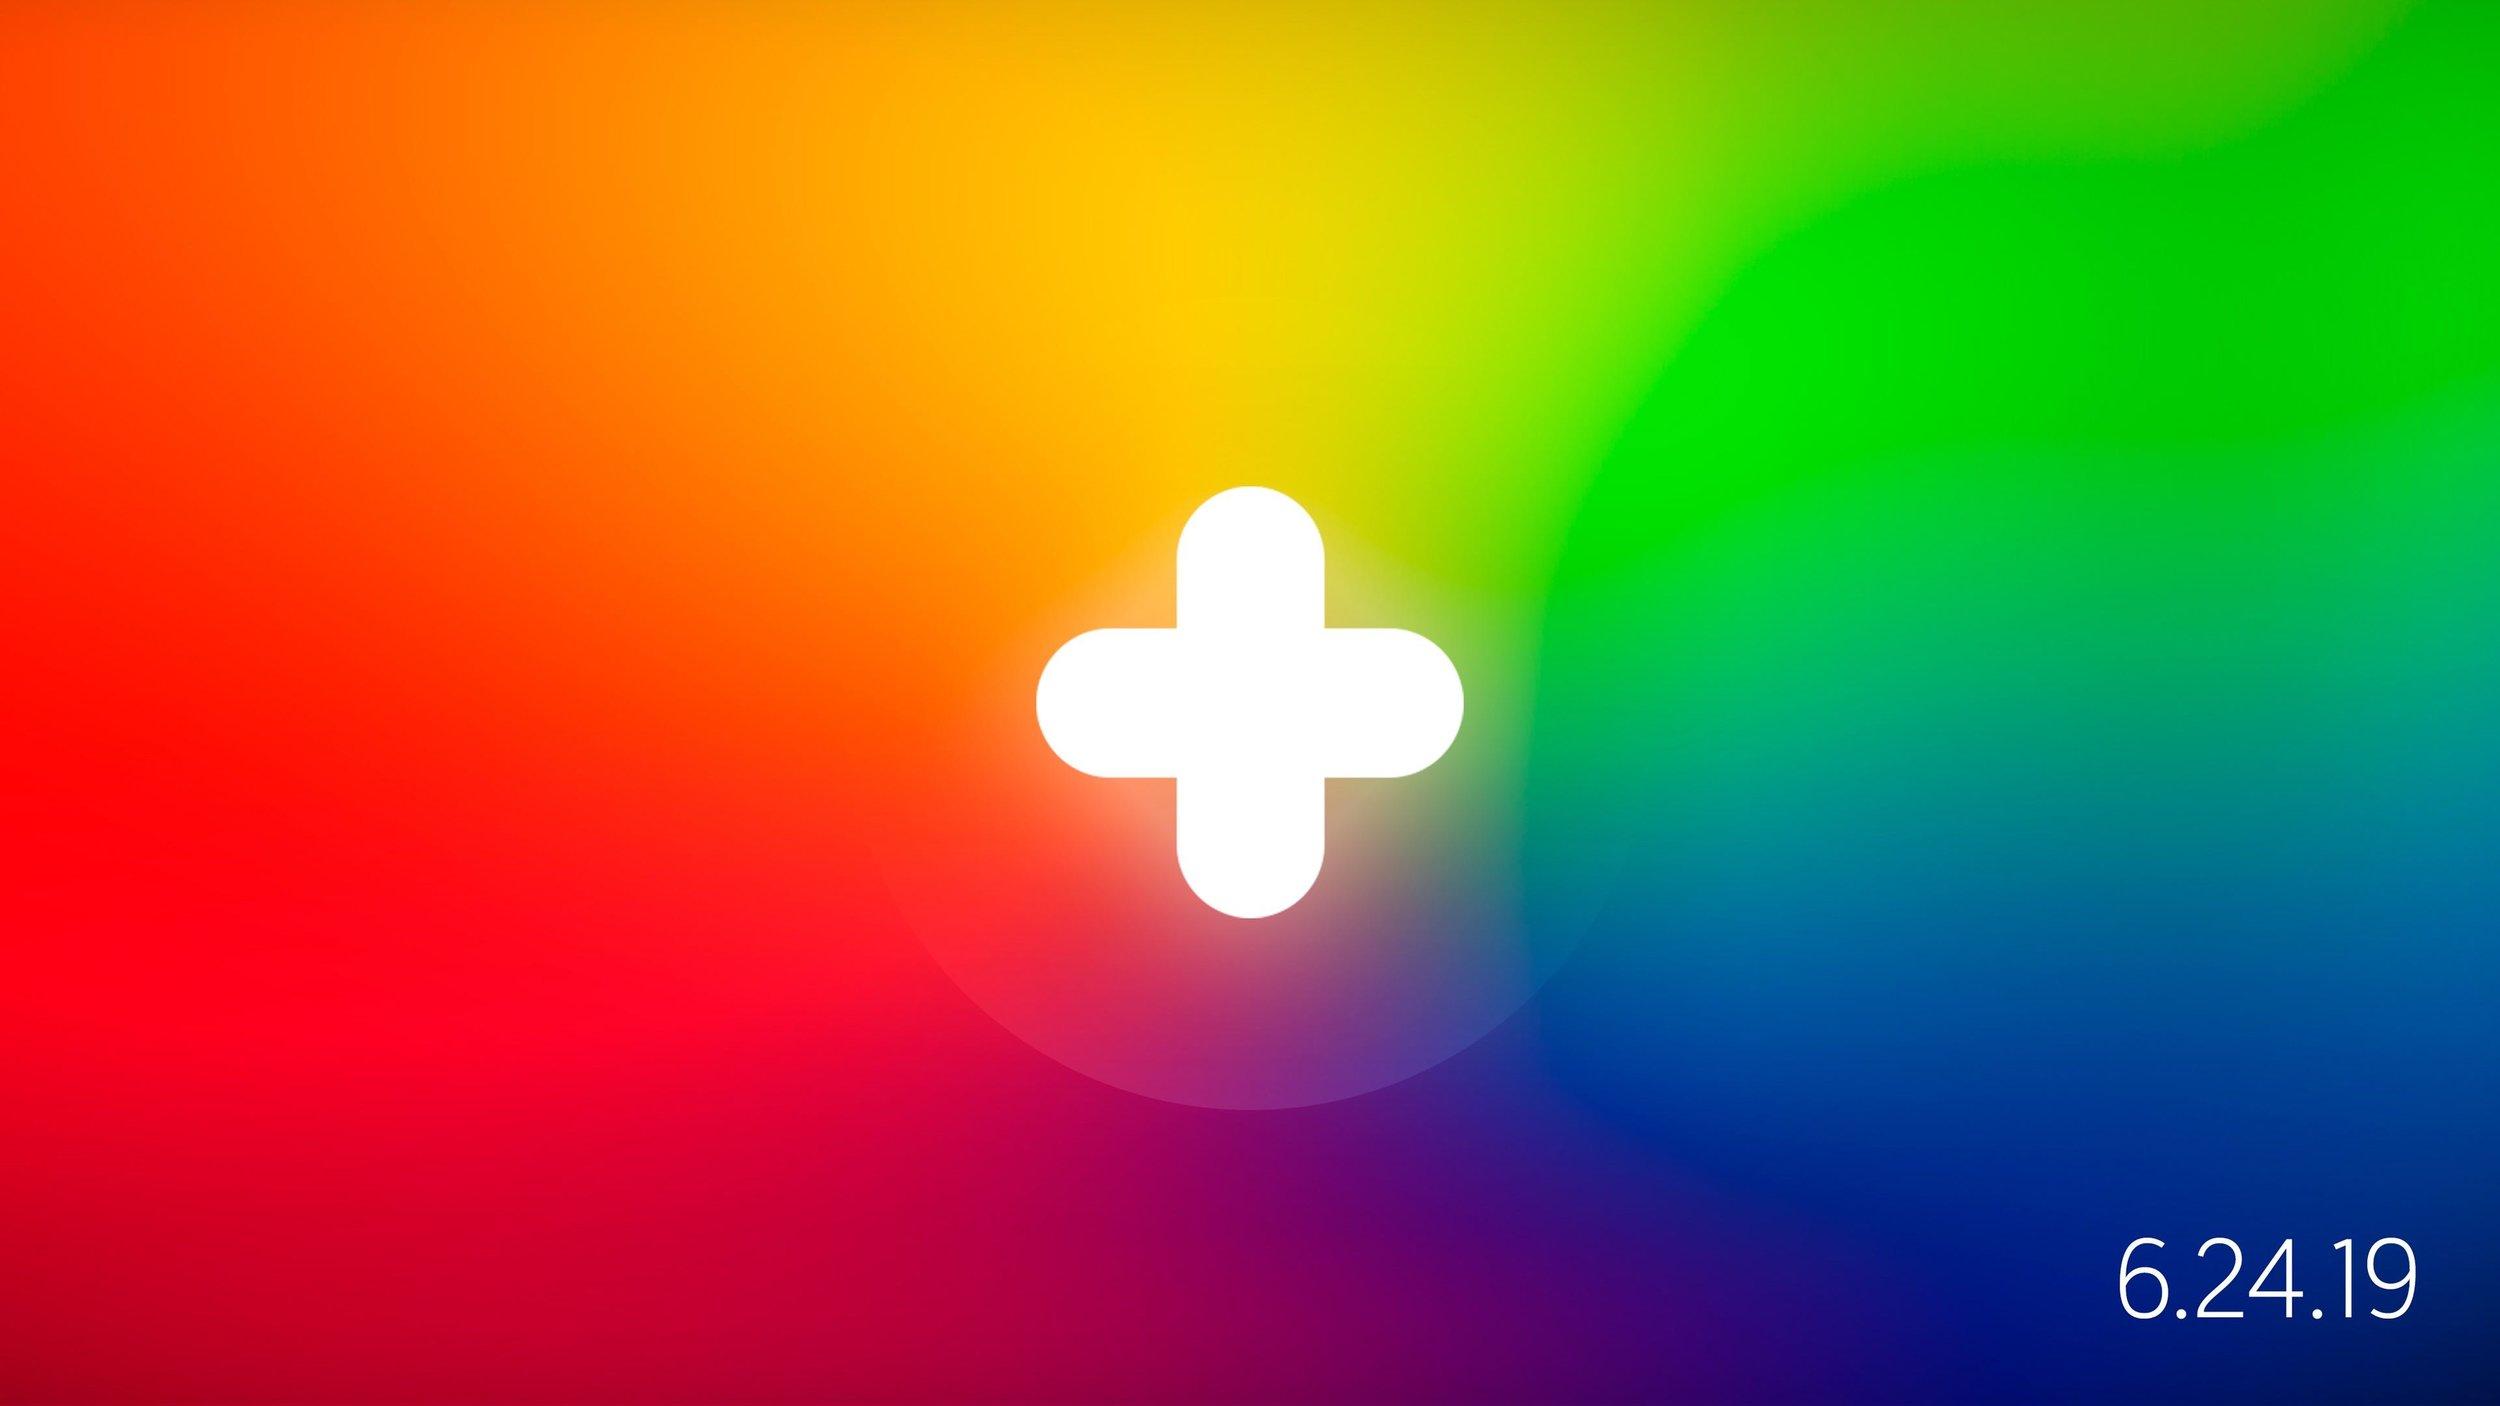 FlipgridLIVE_2019_Rainbow.jpg